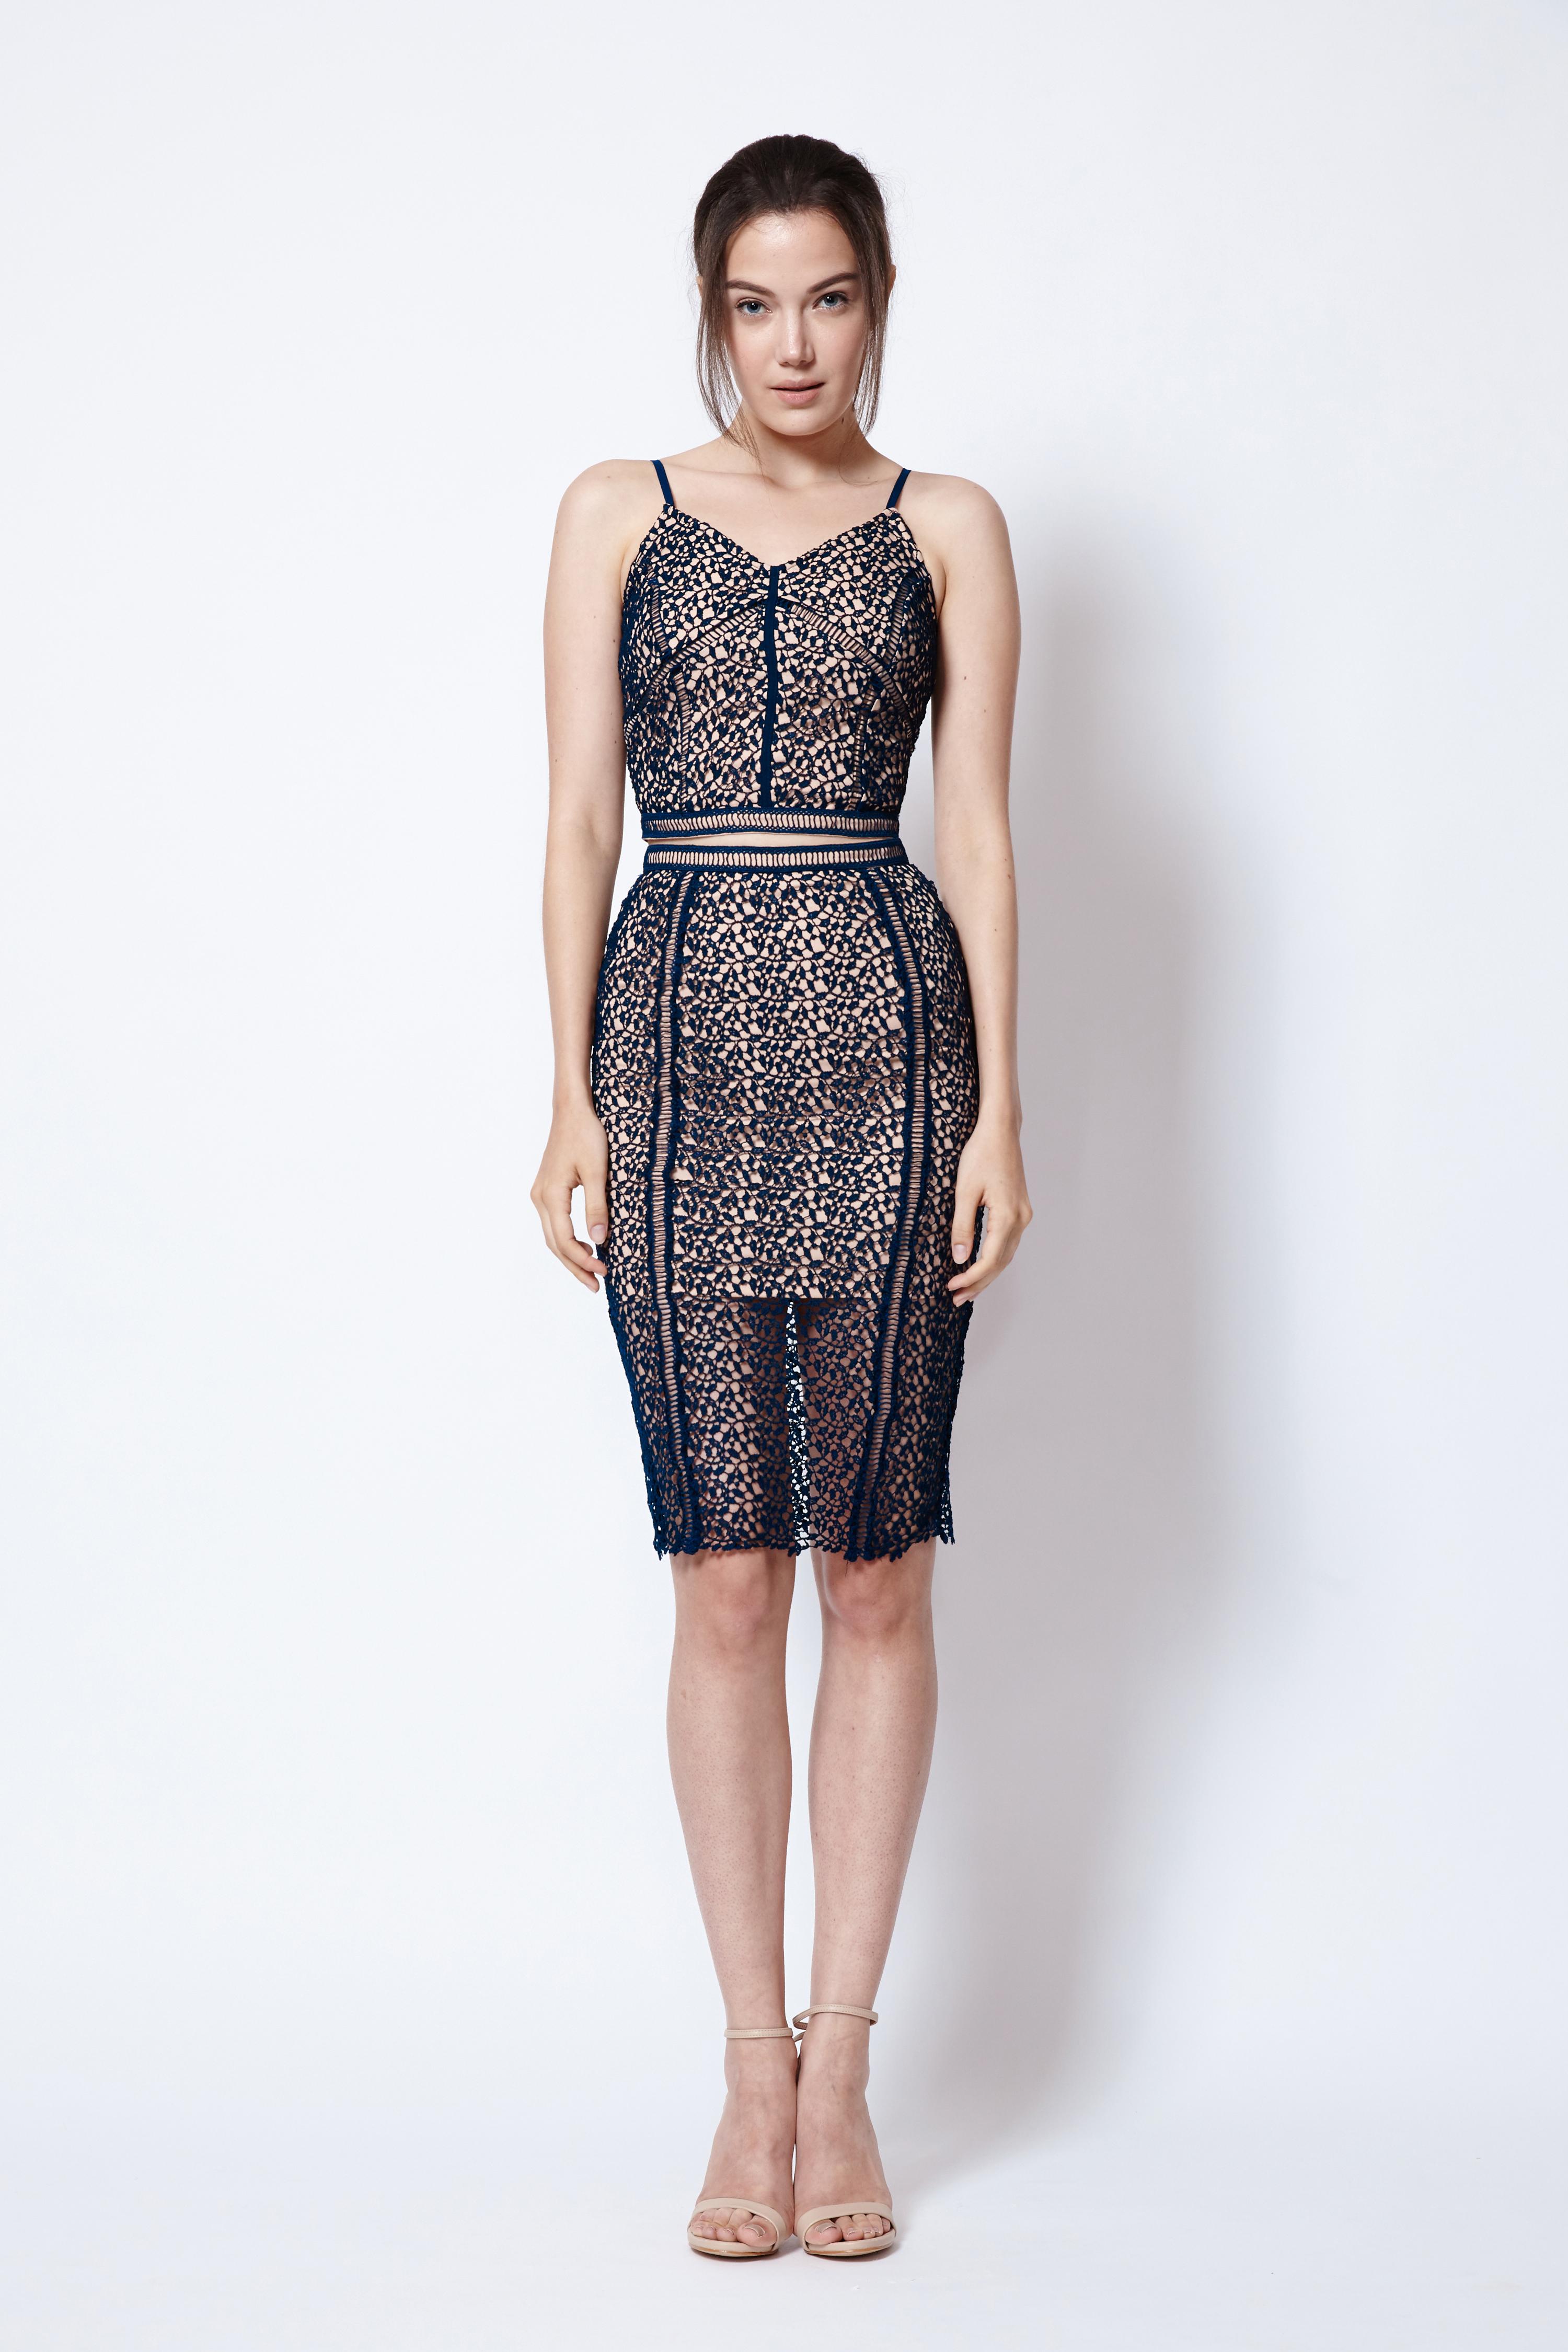 68ce7845d ... Chiara Fitted Midi Skirt in Midnight Blue. Share: Pinterest Tweet  Facebook Tumbler